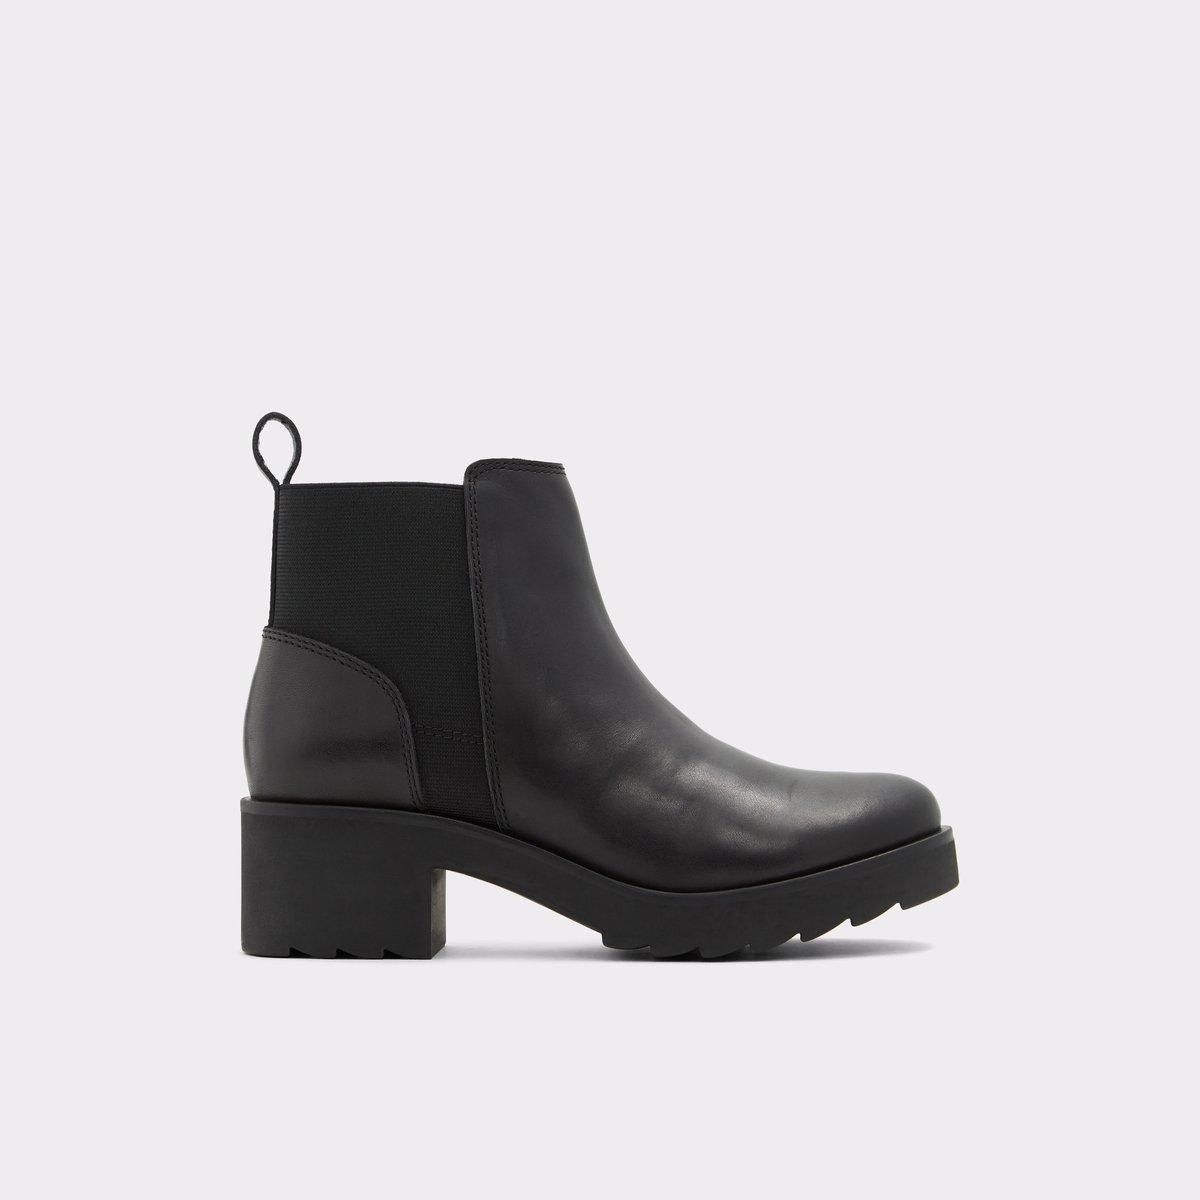 Etiacien Black Women's Boots   ALDO US